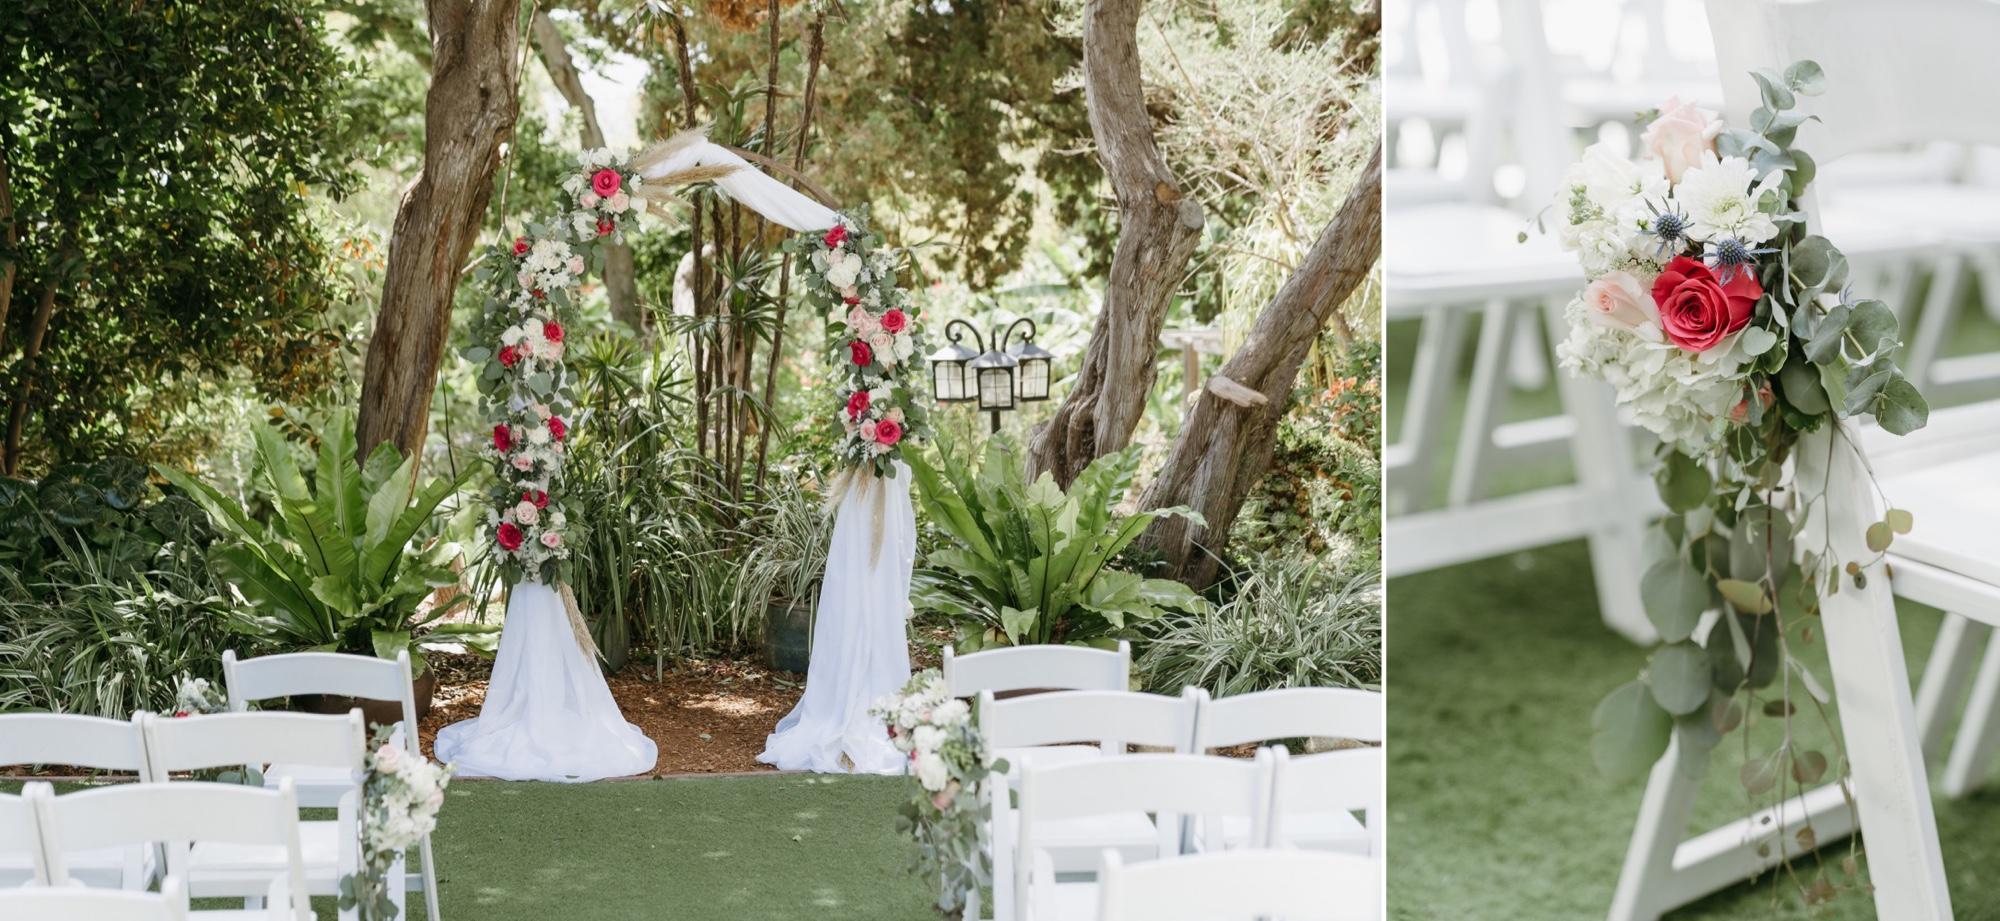 002_Shawna and Steve's Wedding-6_Shawna and Steve's Wedding-12_garden_san_day_botanical_diego_ceremony_florals_wedding.jpg